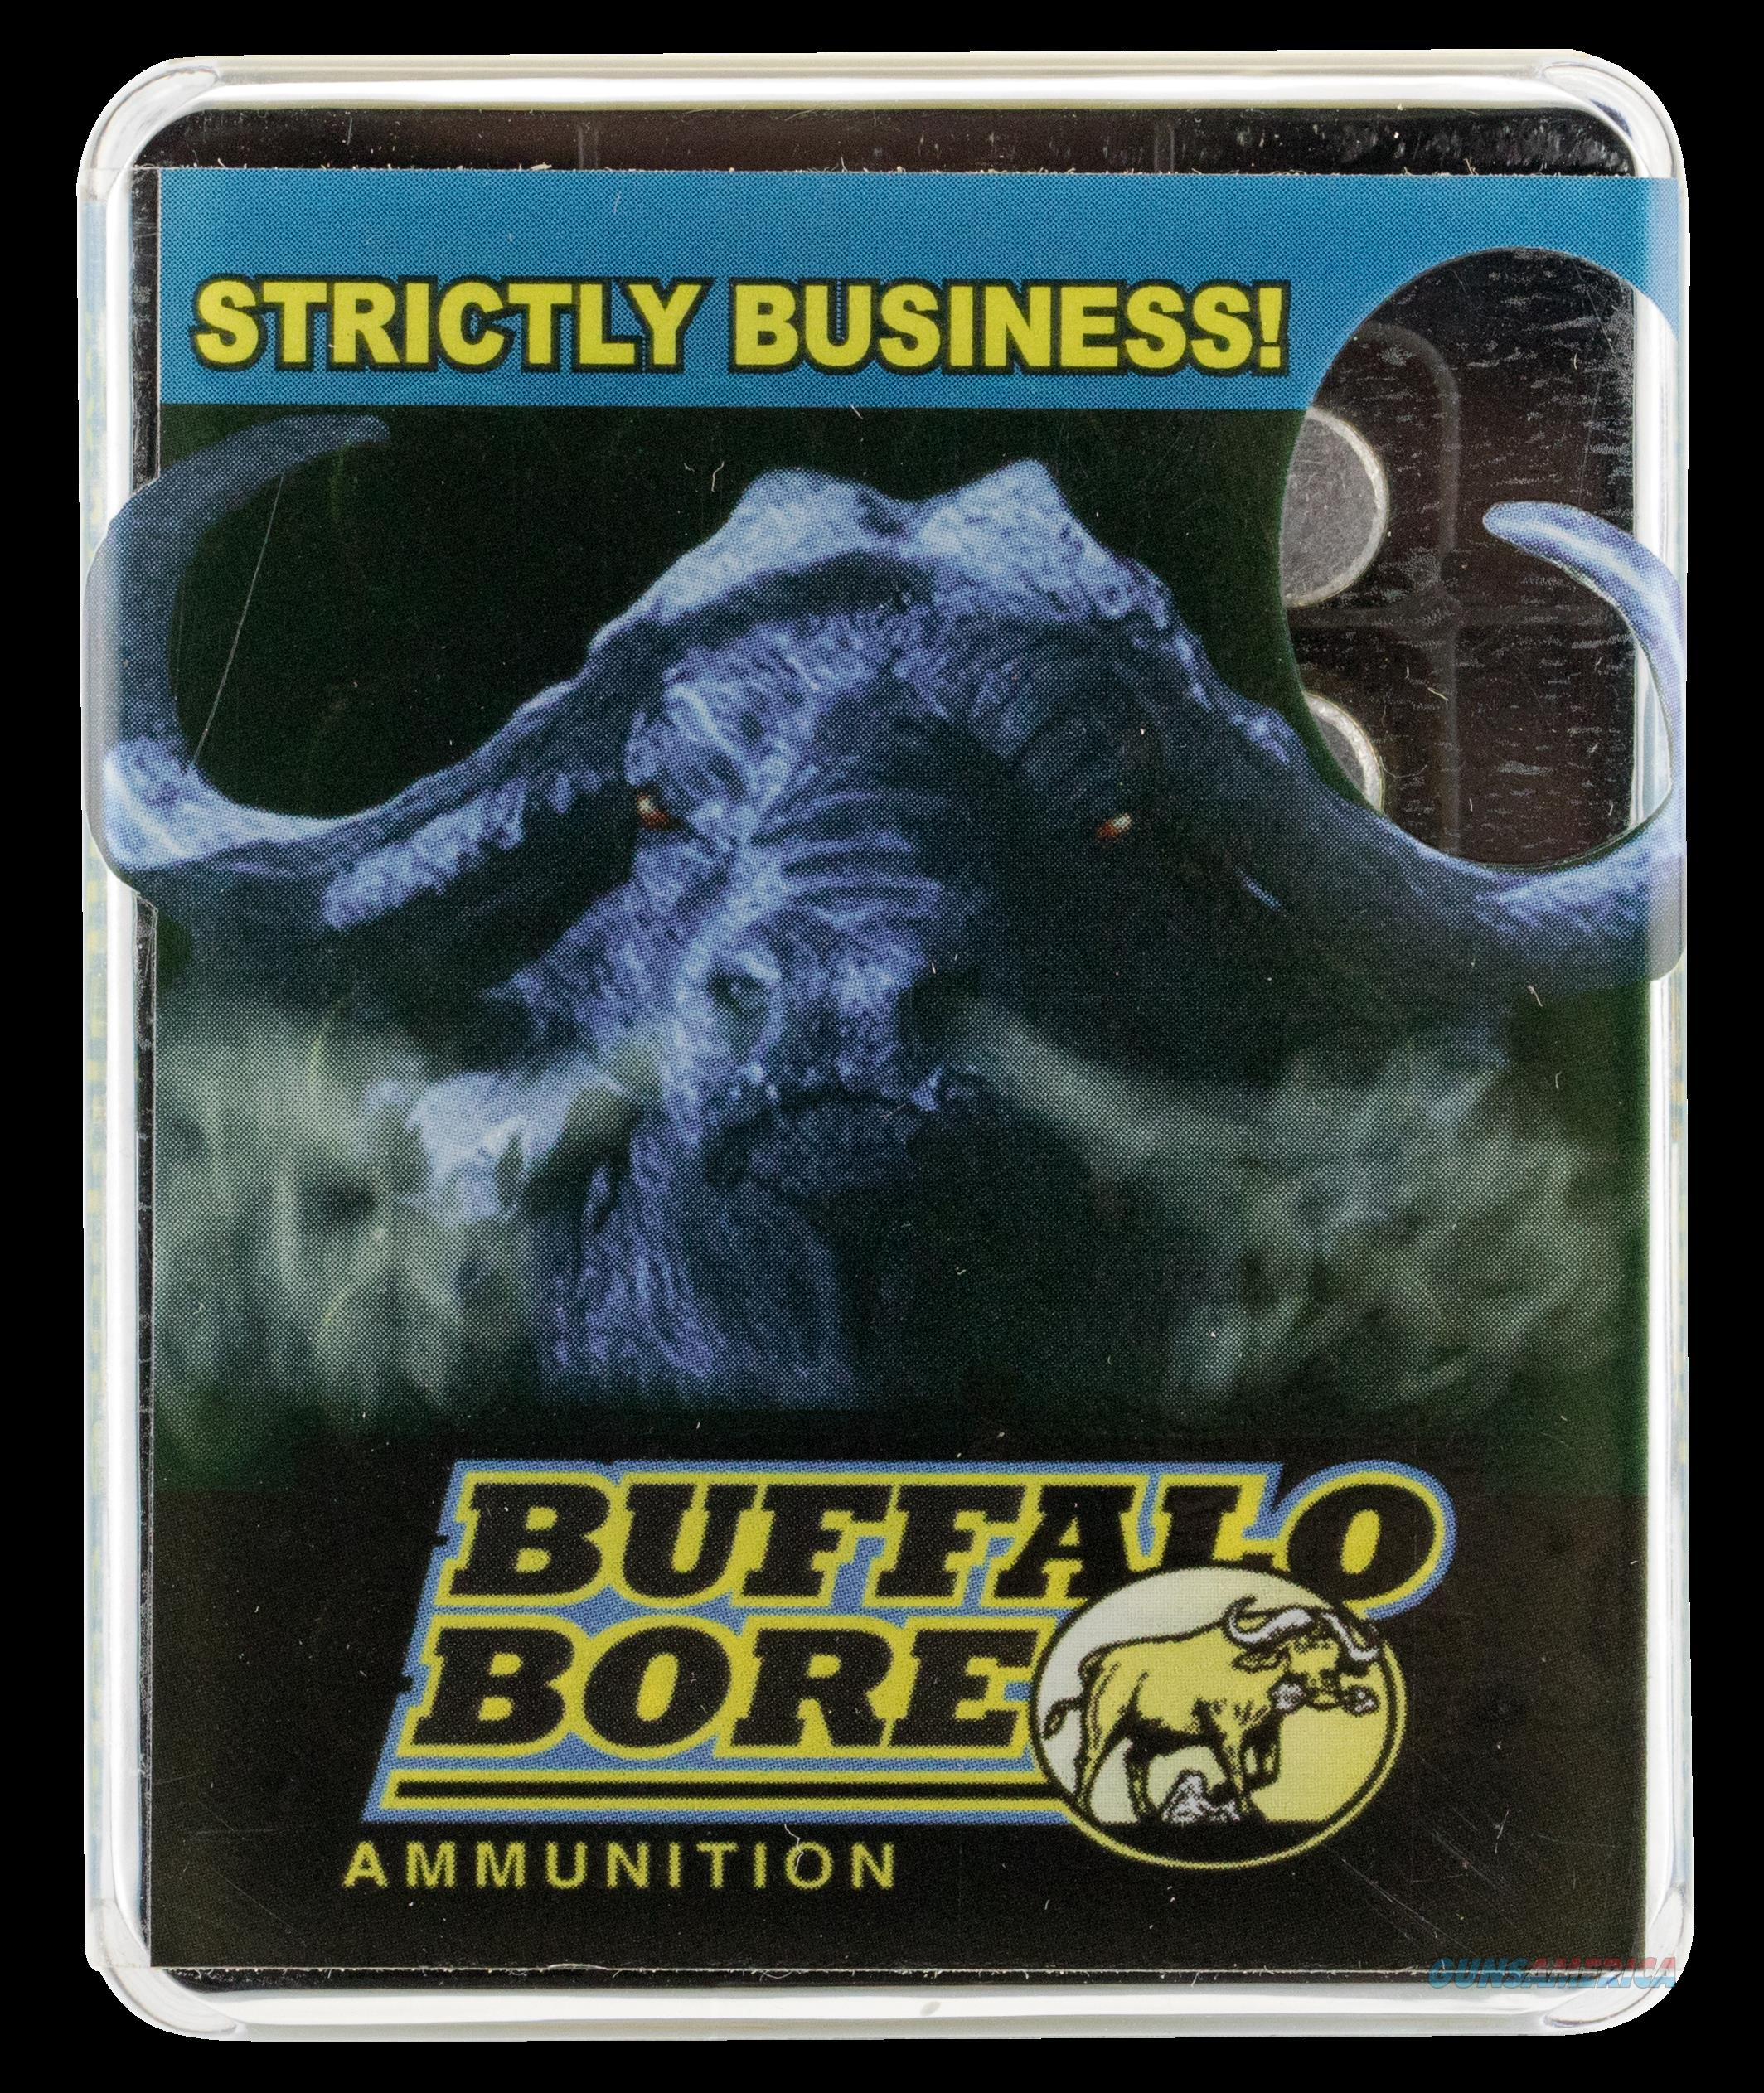 Buffalo Bore Ammunition Pistol, Bba 30a-20 32acp +p   75gr Hcfn  20-12  Guns > Pistols > 1911 Pistol Copies (non-Colt)